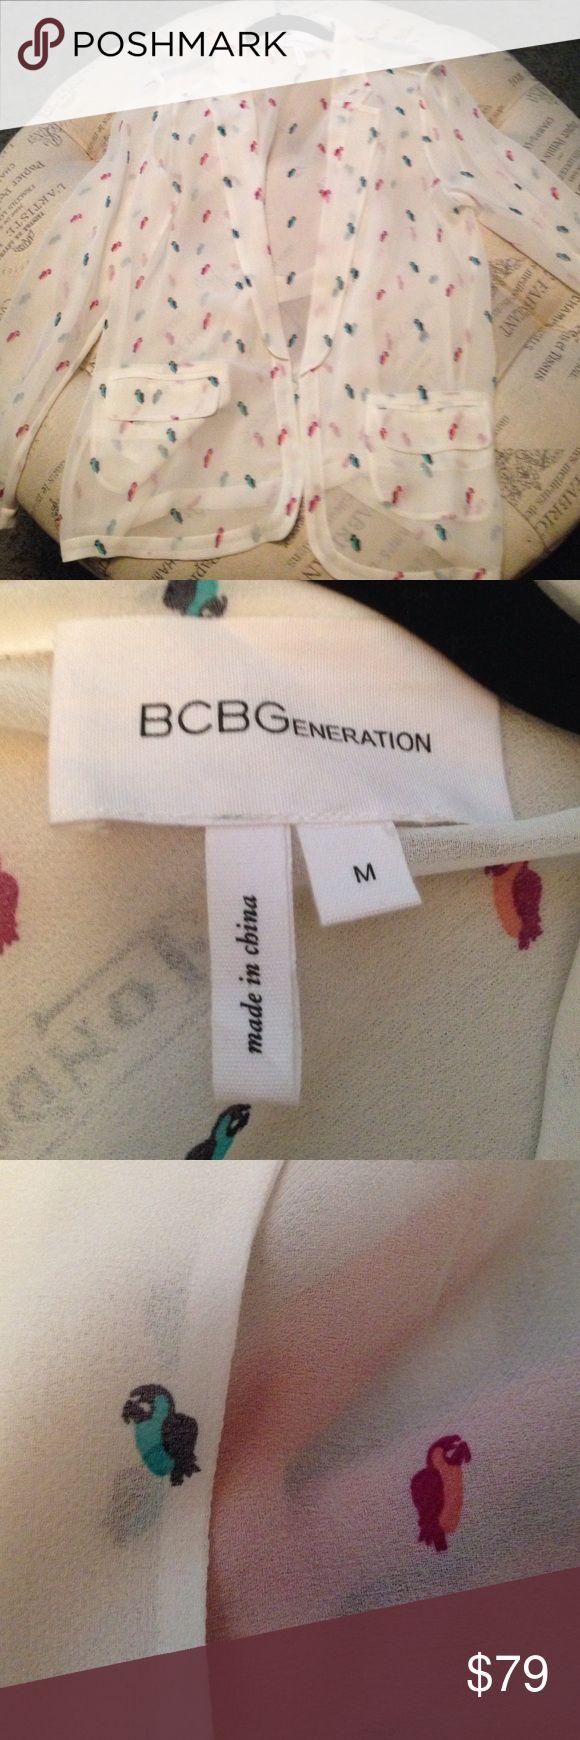 BCBGeneration sheer parrot blazer size M Only wore once sheer parrot blazer by BCBGeneration size M BCBGeneration Jackets & Coats Blazers